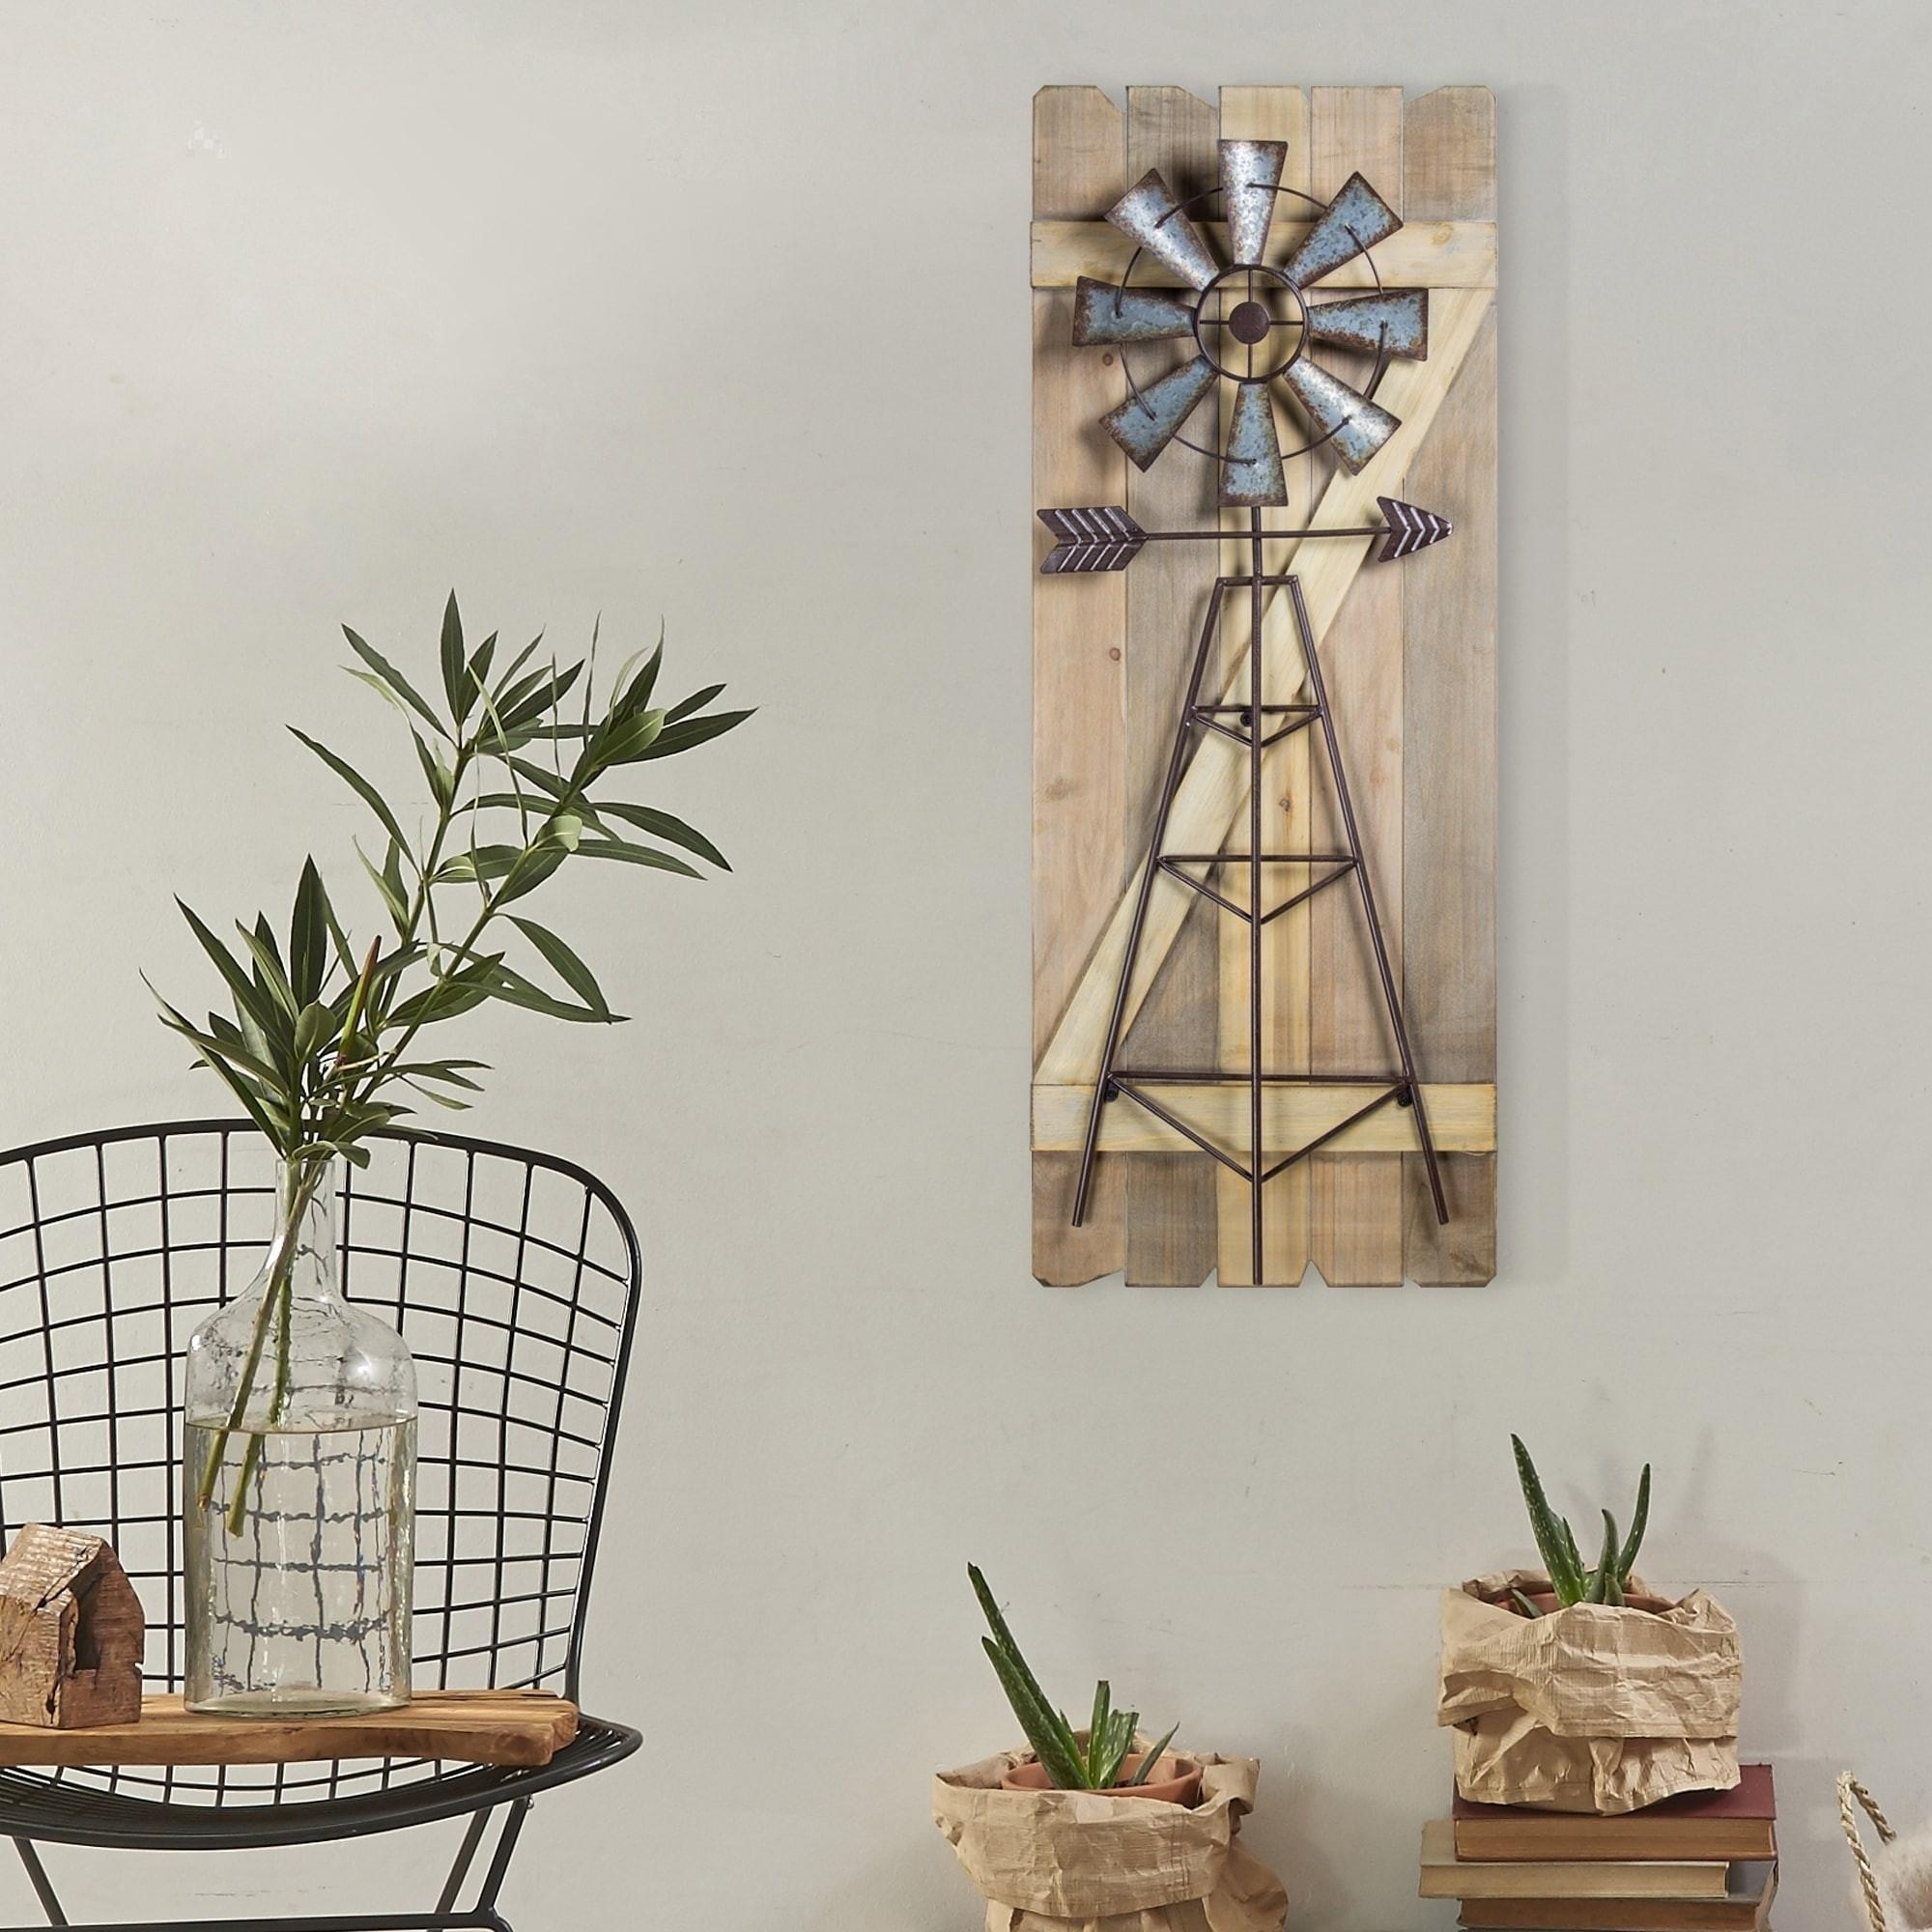 Magnificent Metal Windmill Wall Decor Crest Wall Art Ideas For 2018 Windmill Wall Art (Gallery 6 of 20)